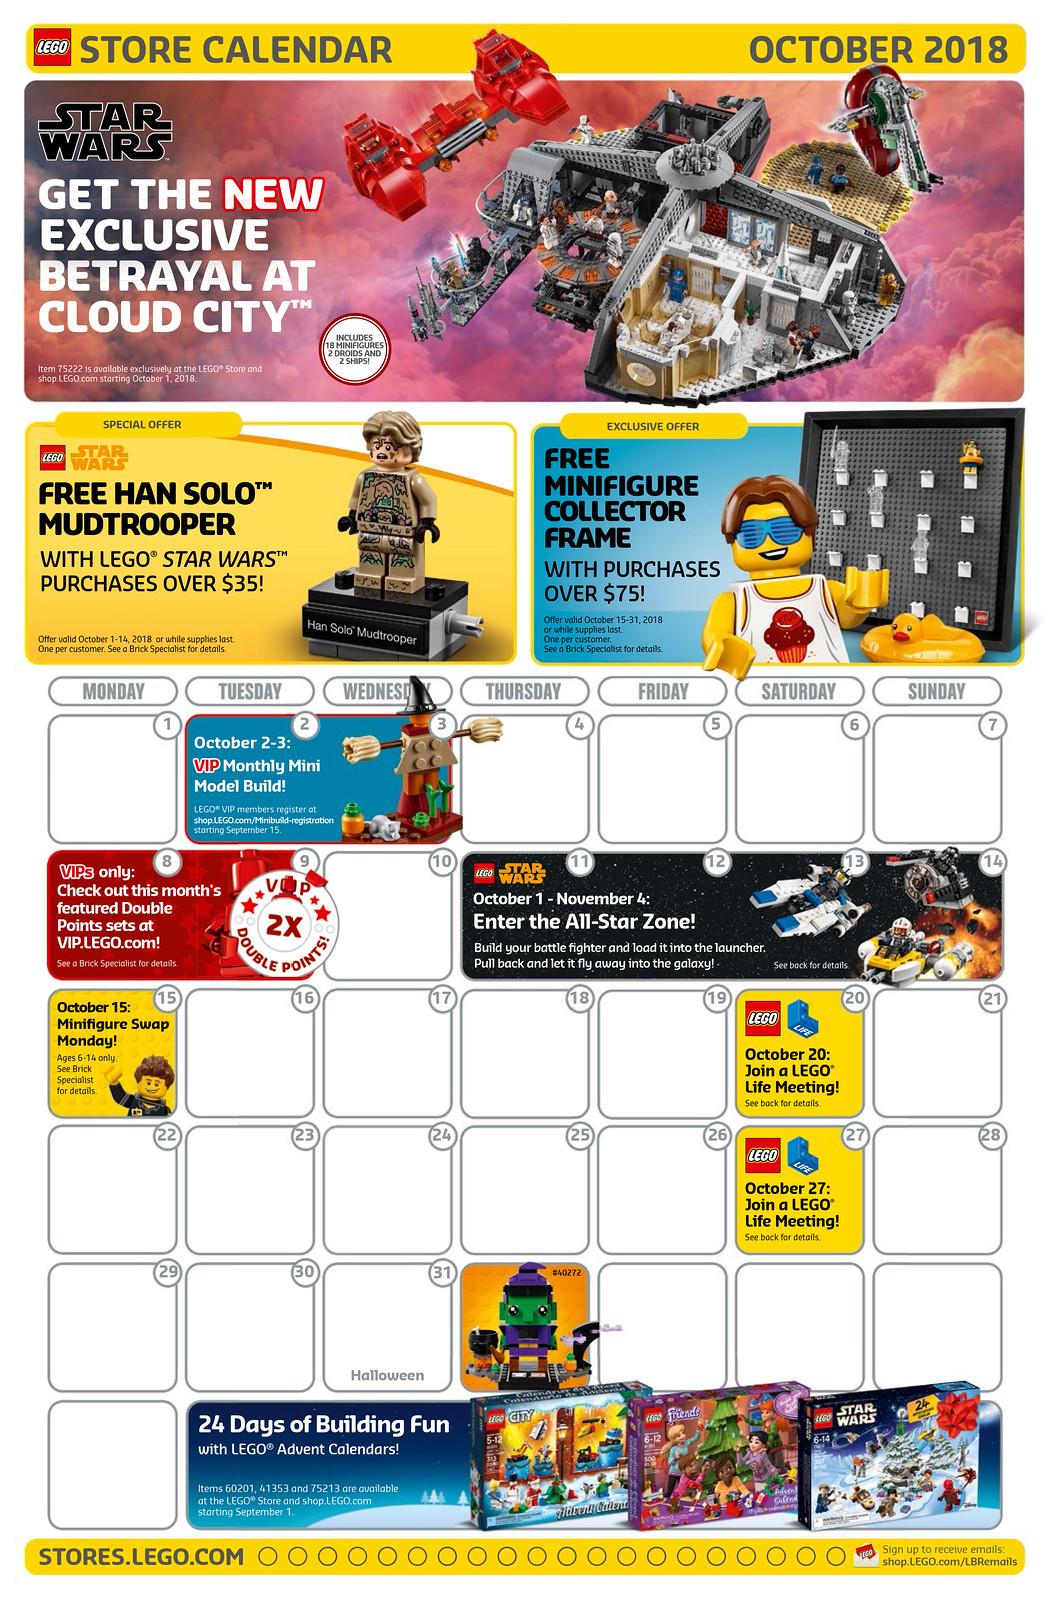 LEGO Brand Store Calendar October 2018